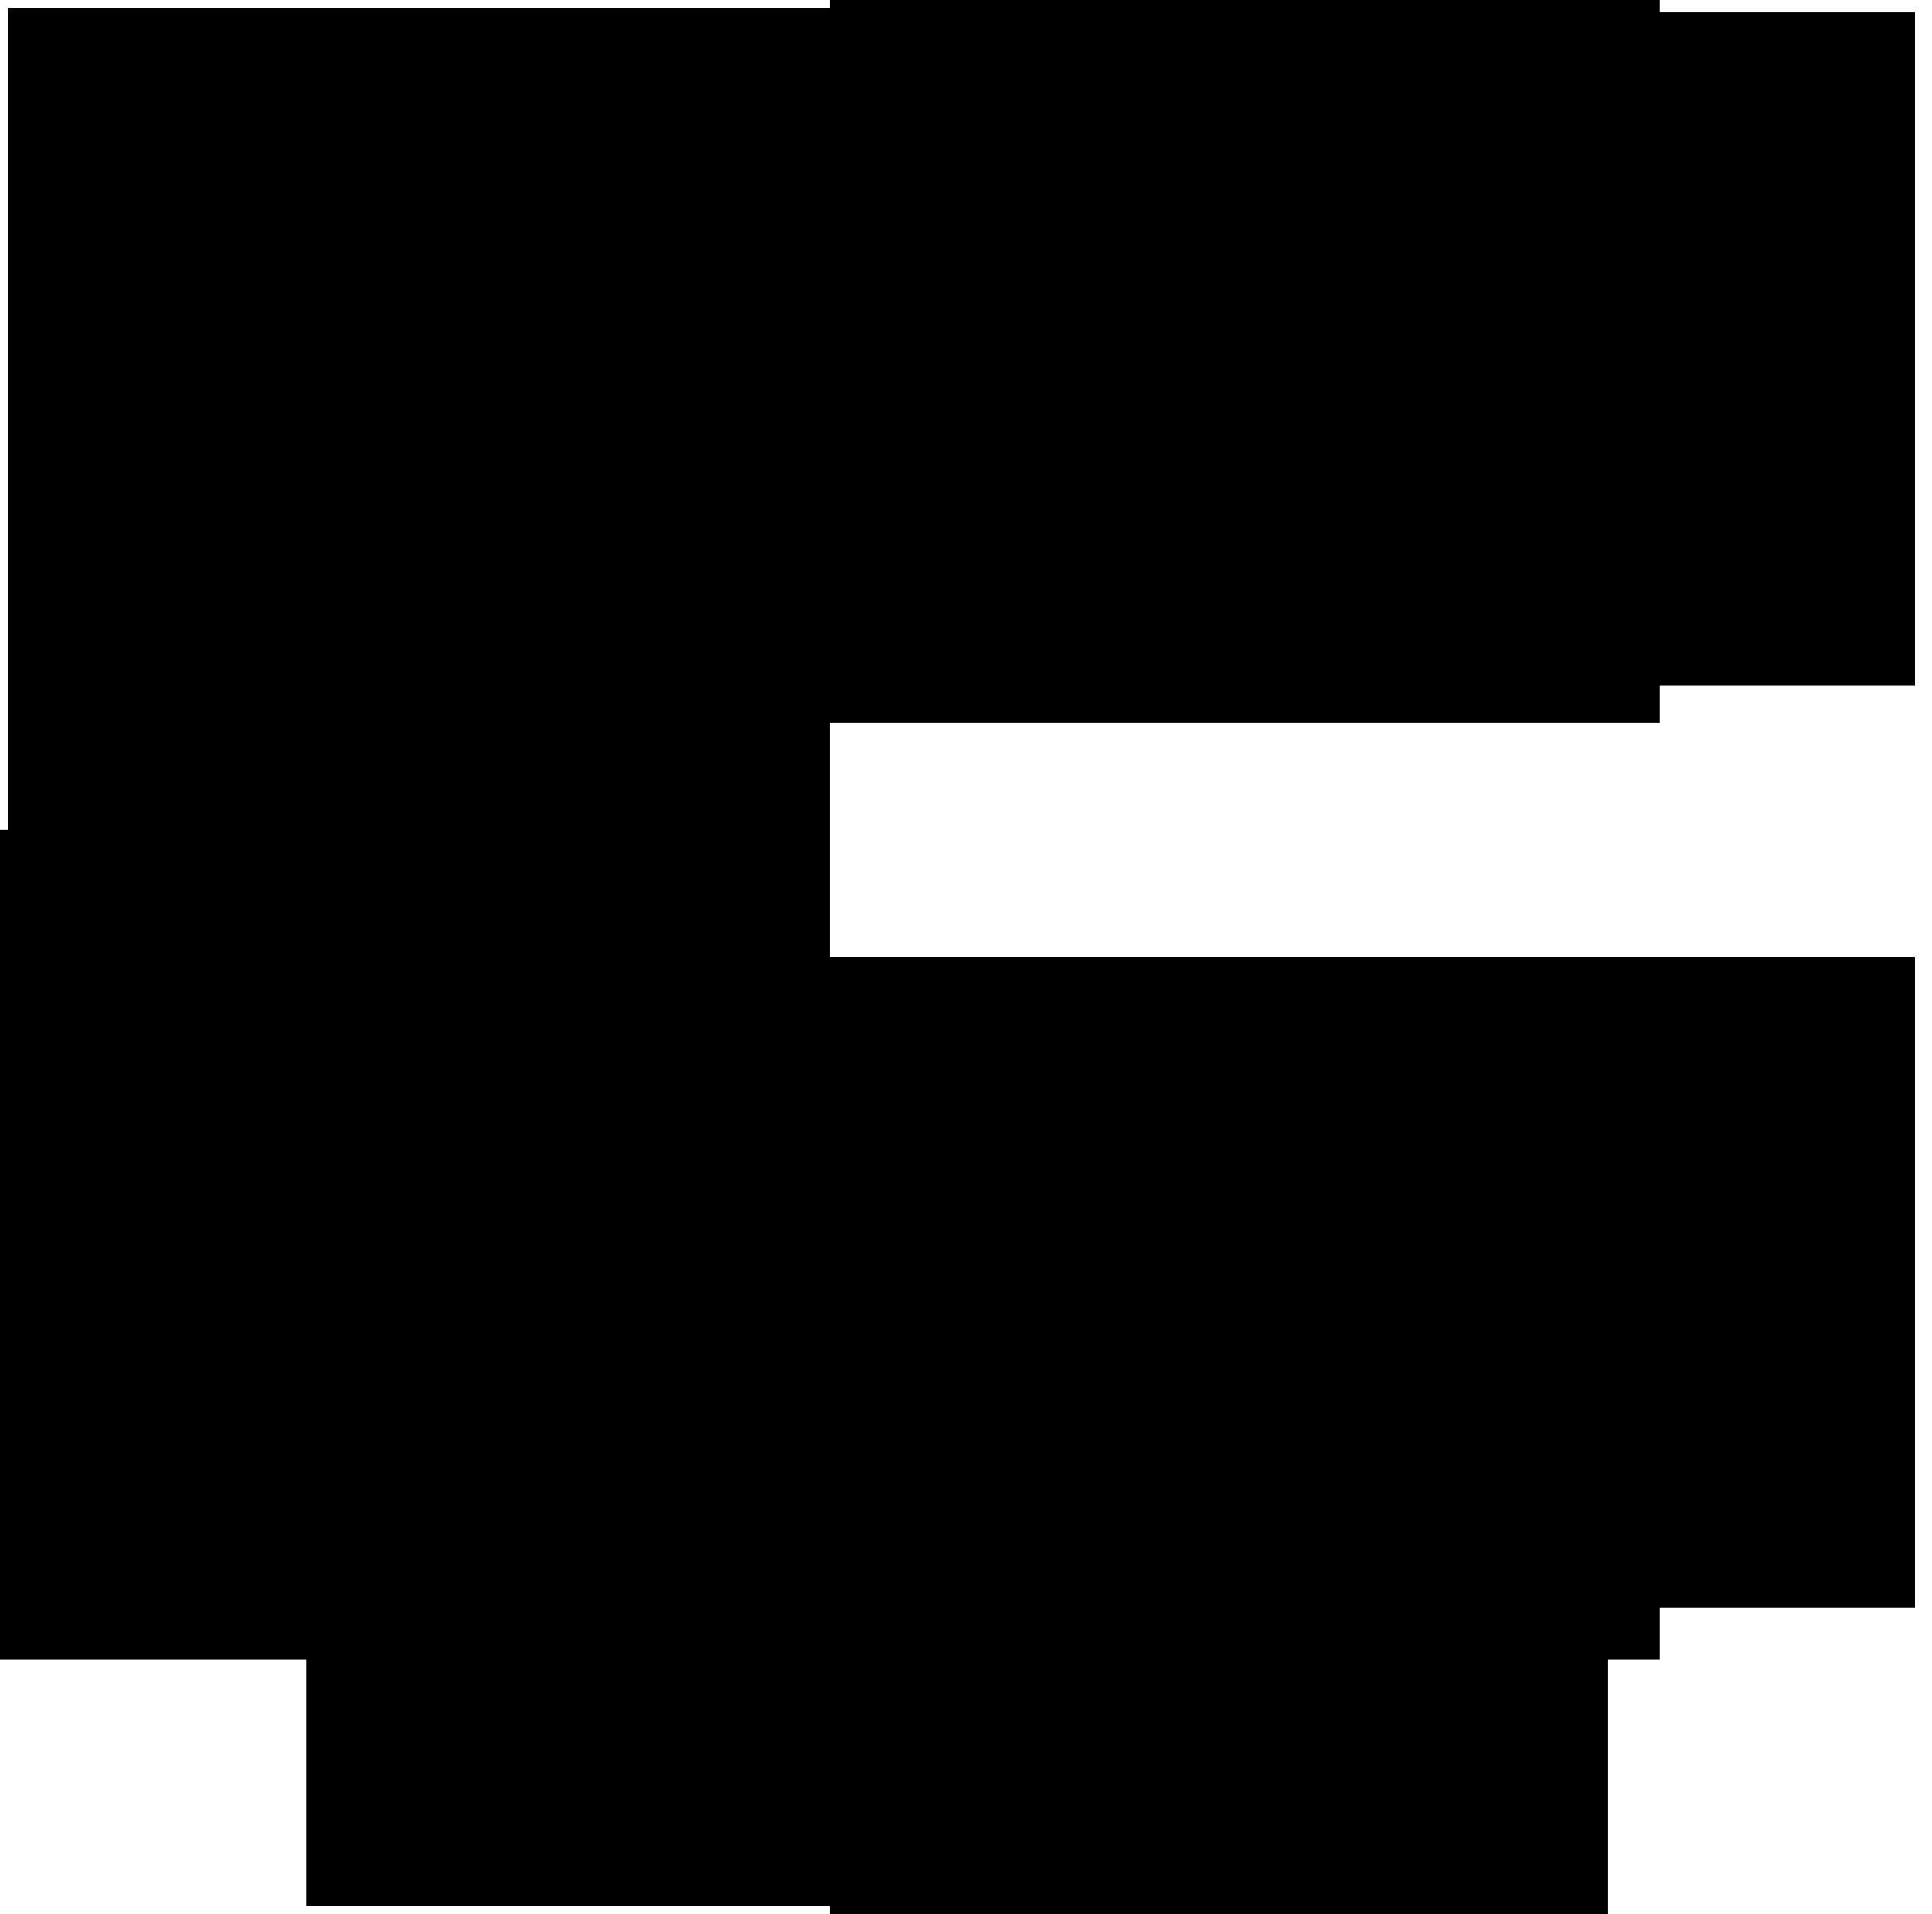 goethe-symbol